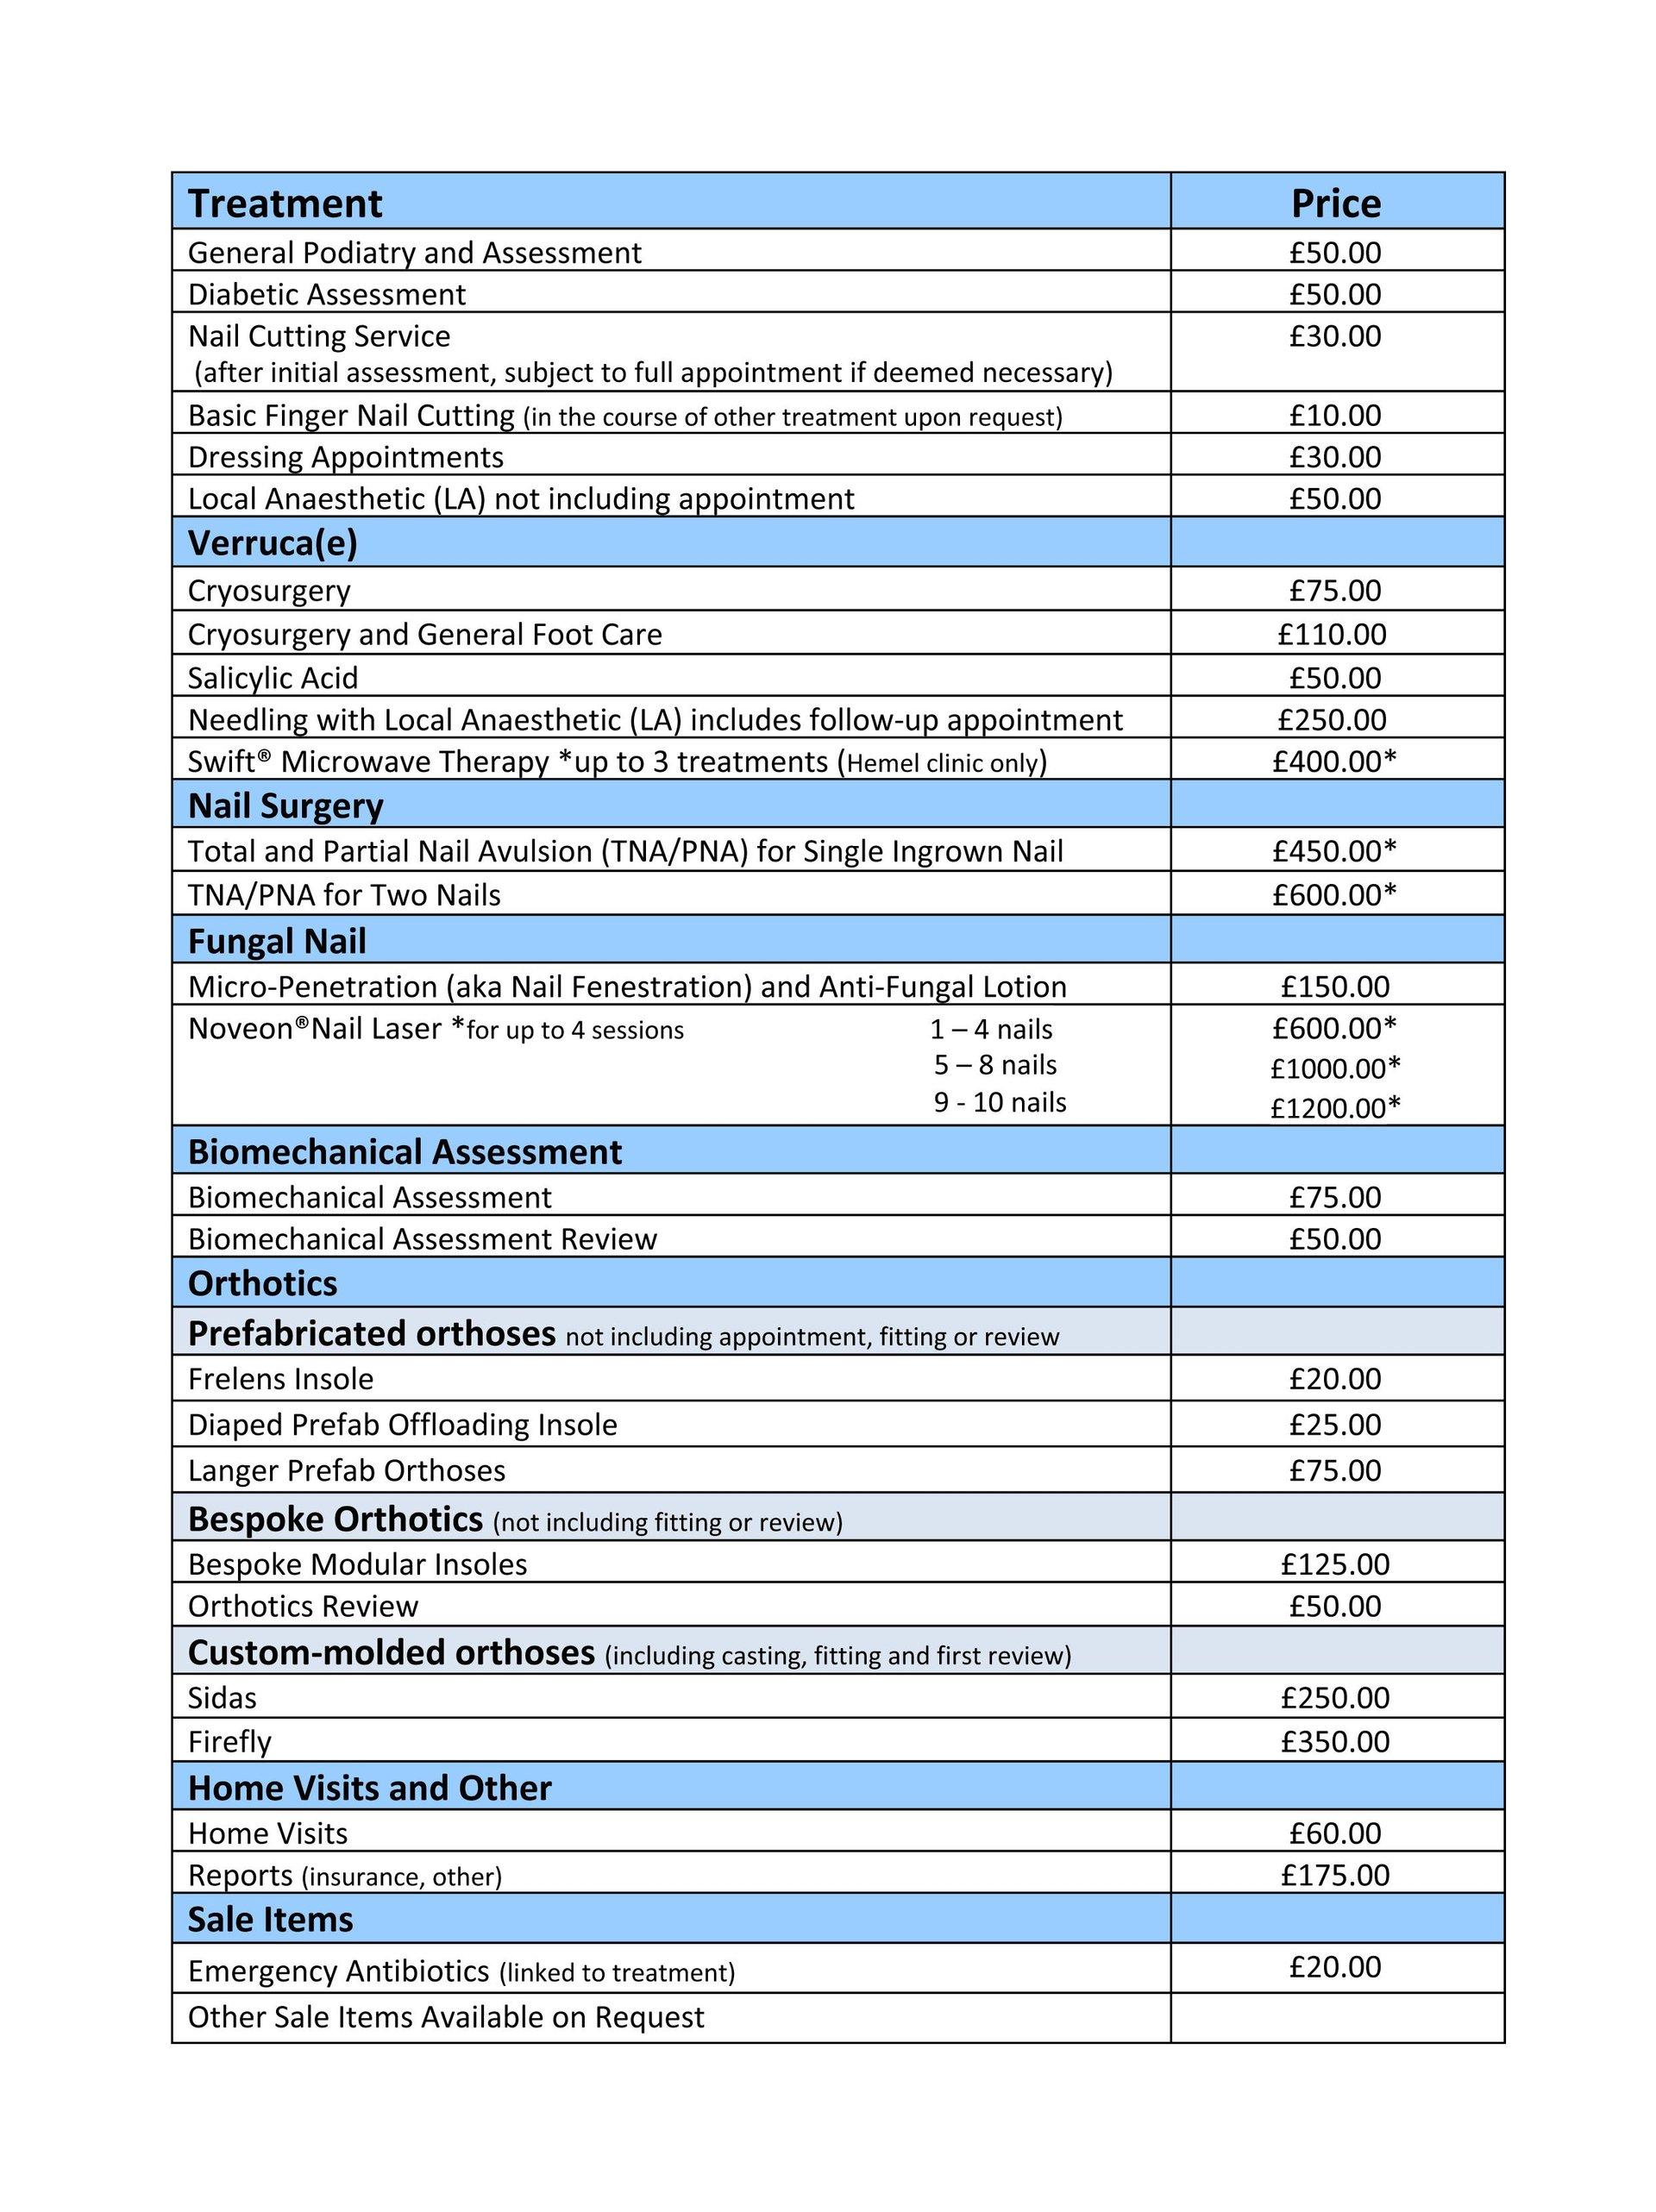 Podiatry treatment rates